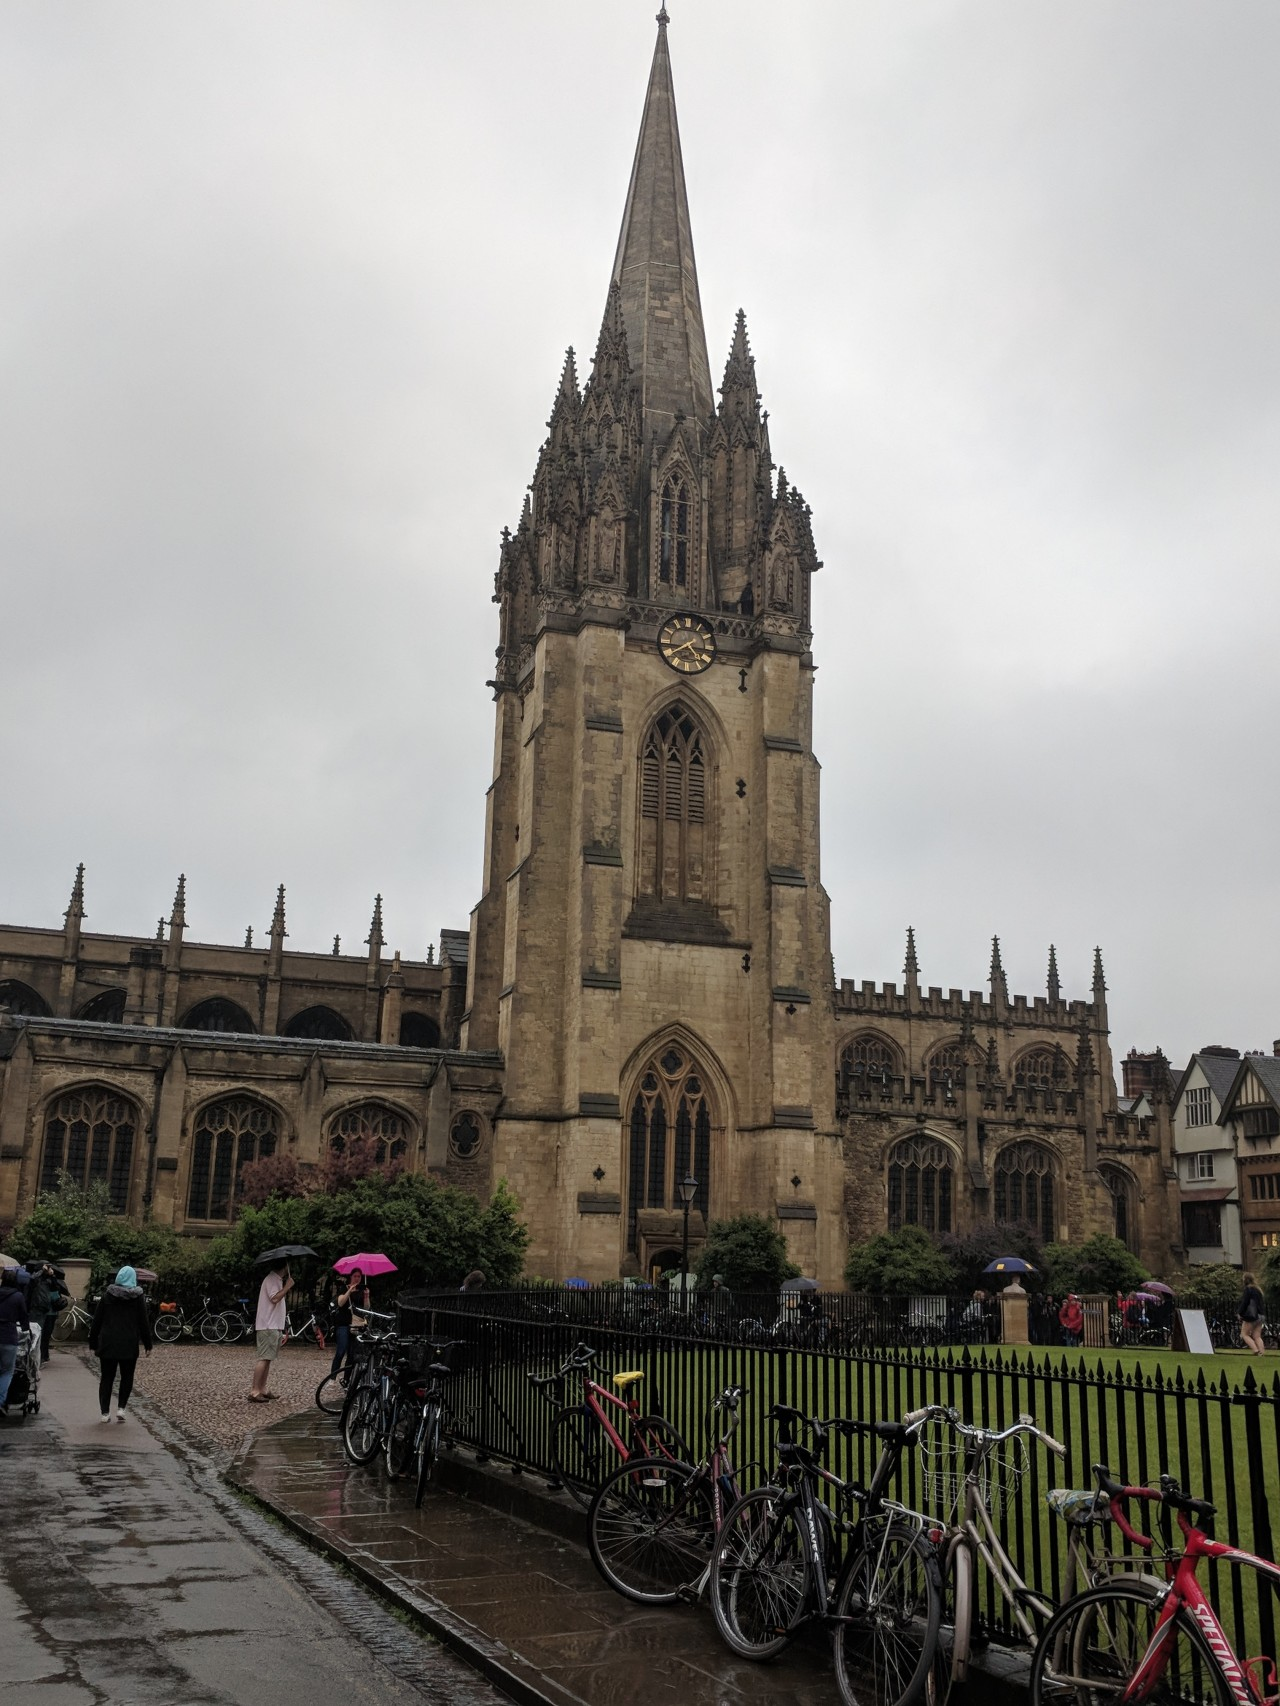 Day 3c: OxfordUniversity